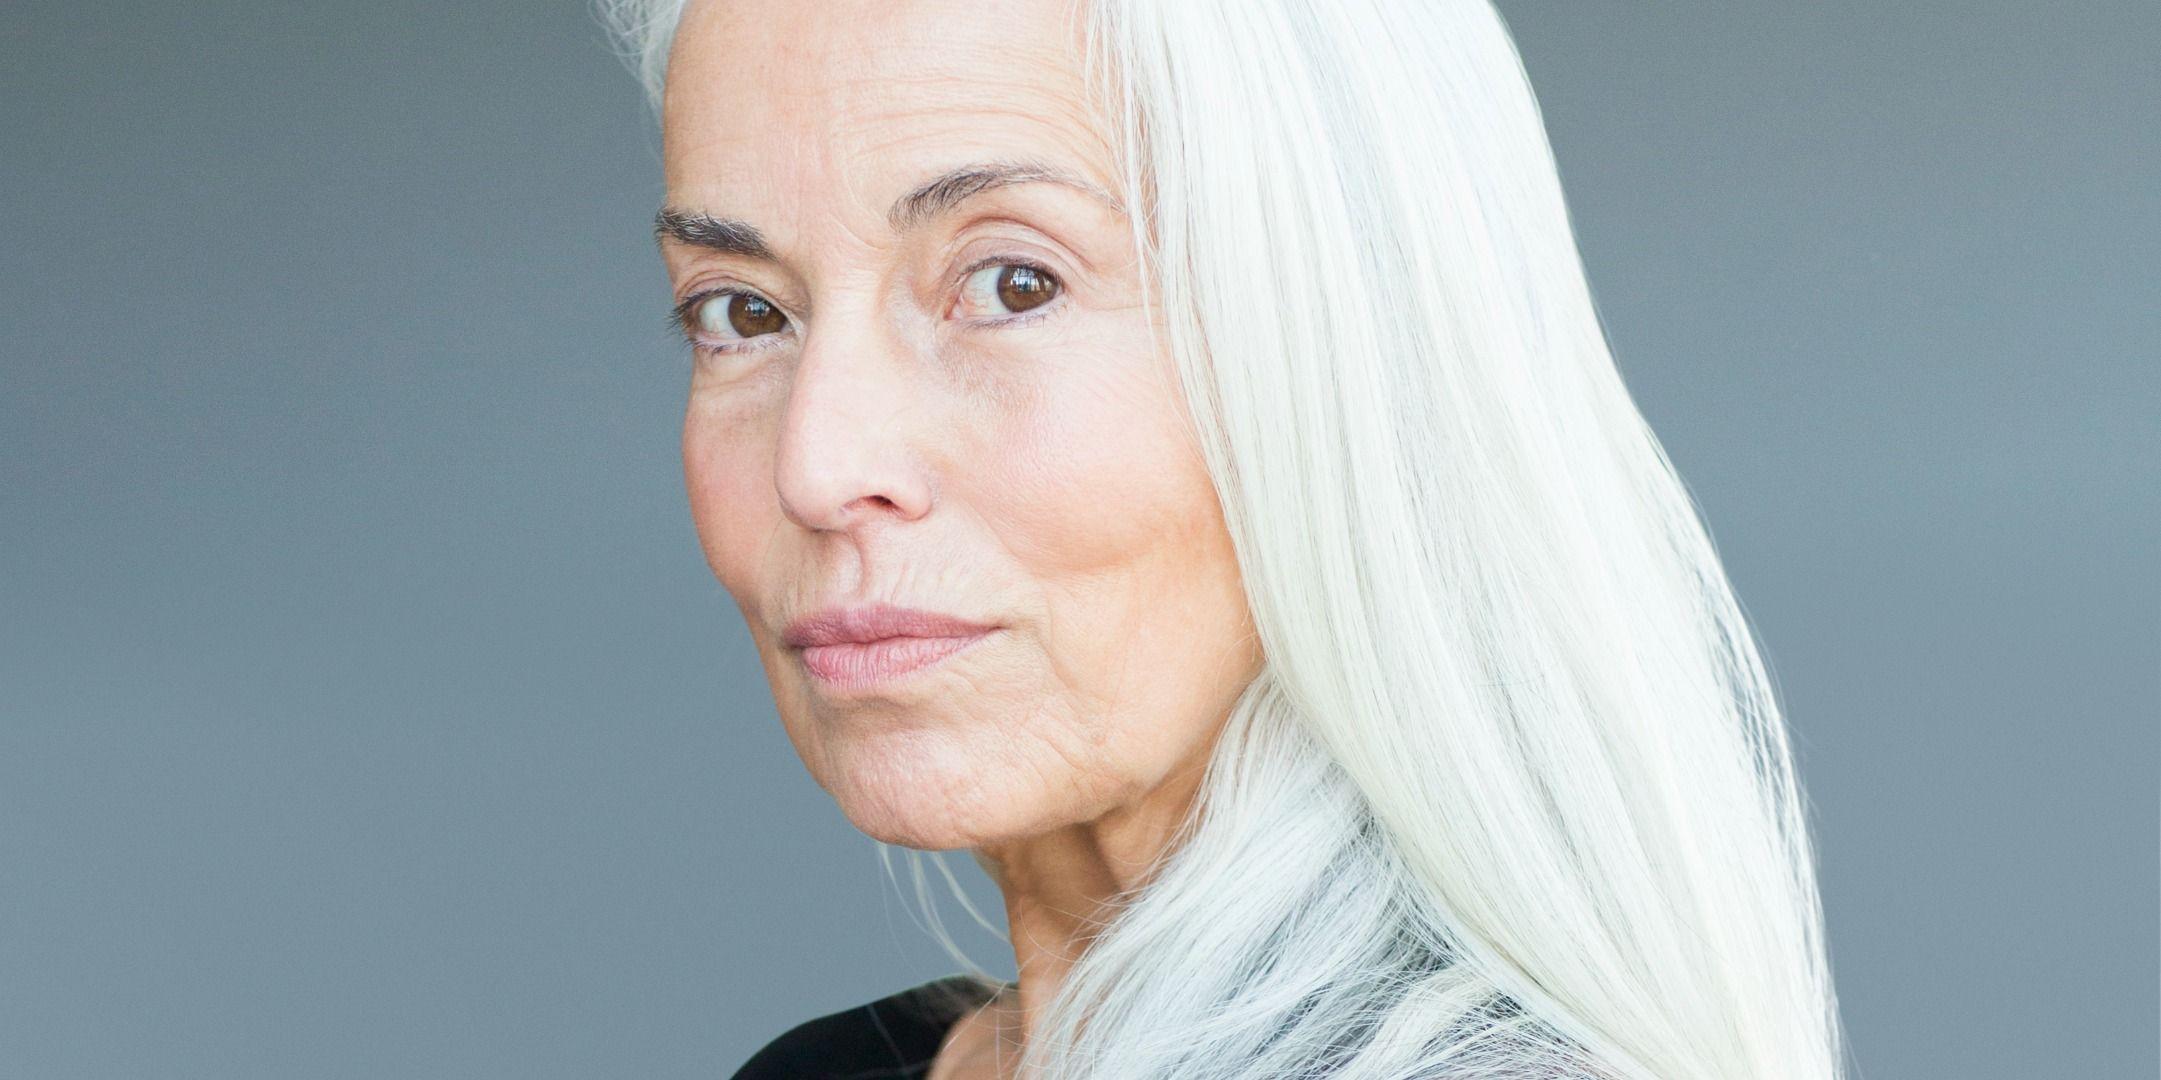 French model Yasmina Rossi: biography, career, personal life 17